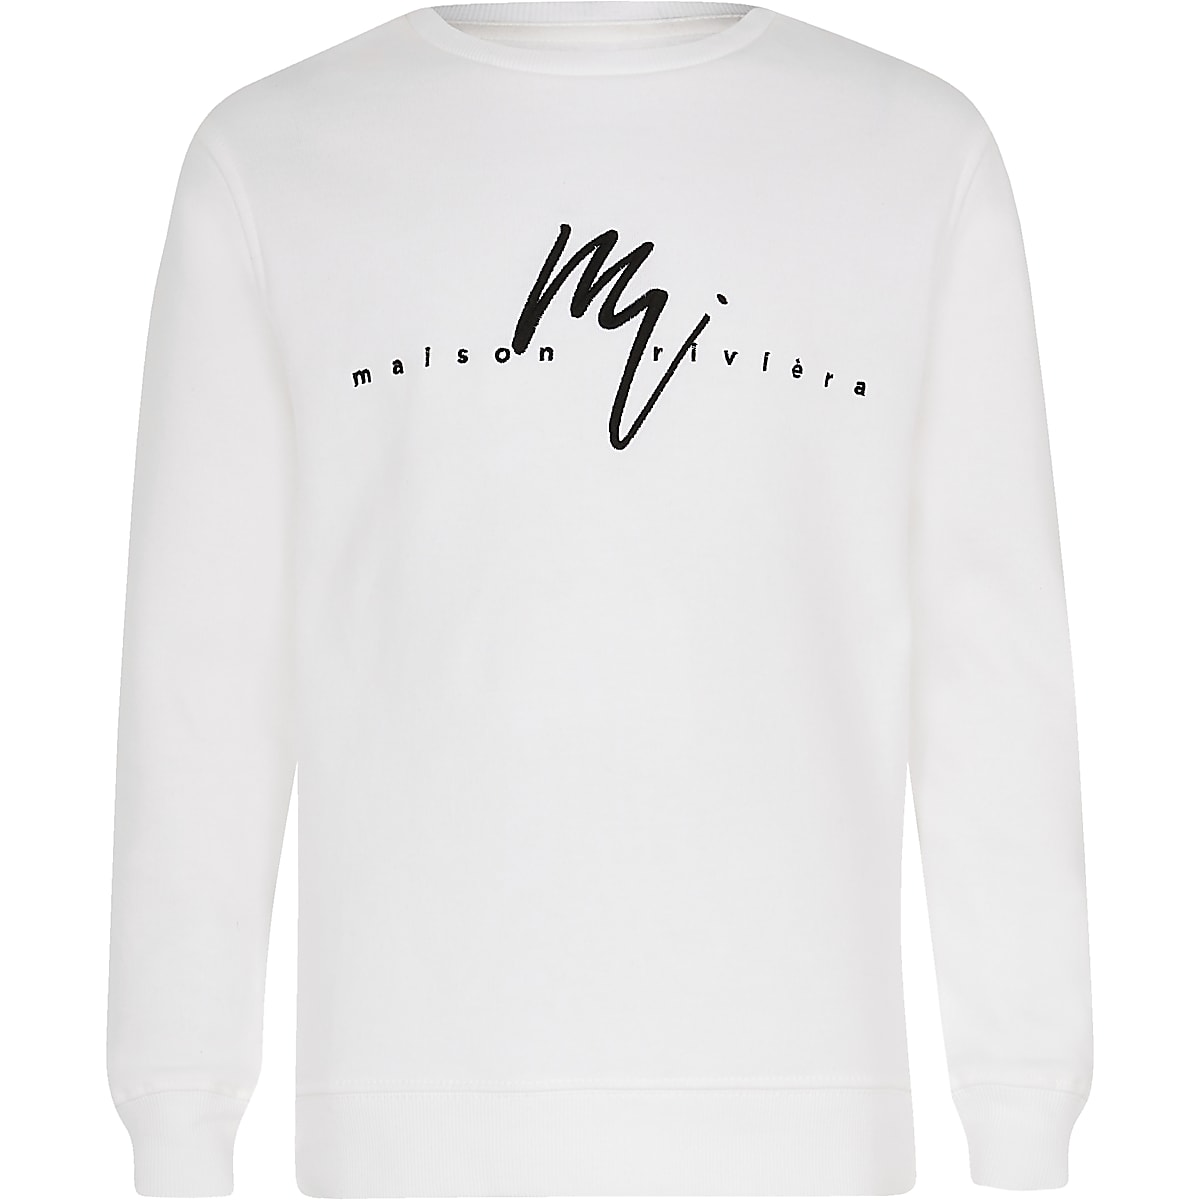 Boys white 'Masion riviera' sweatshirt